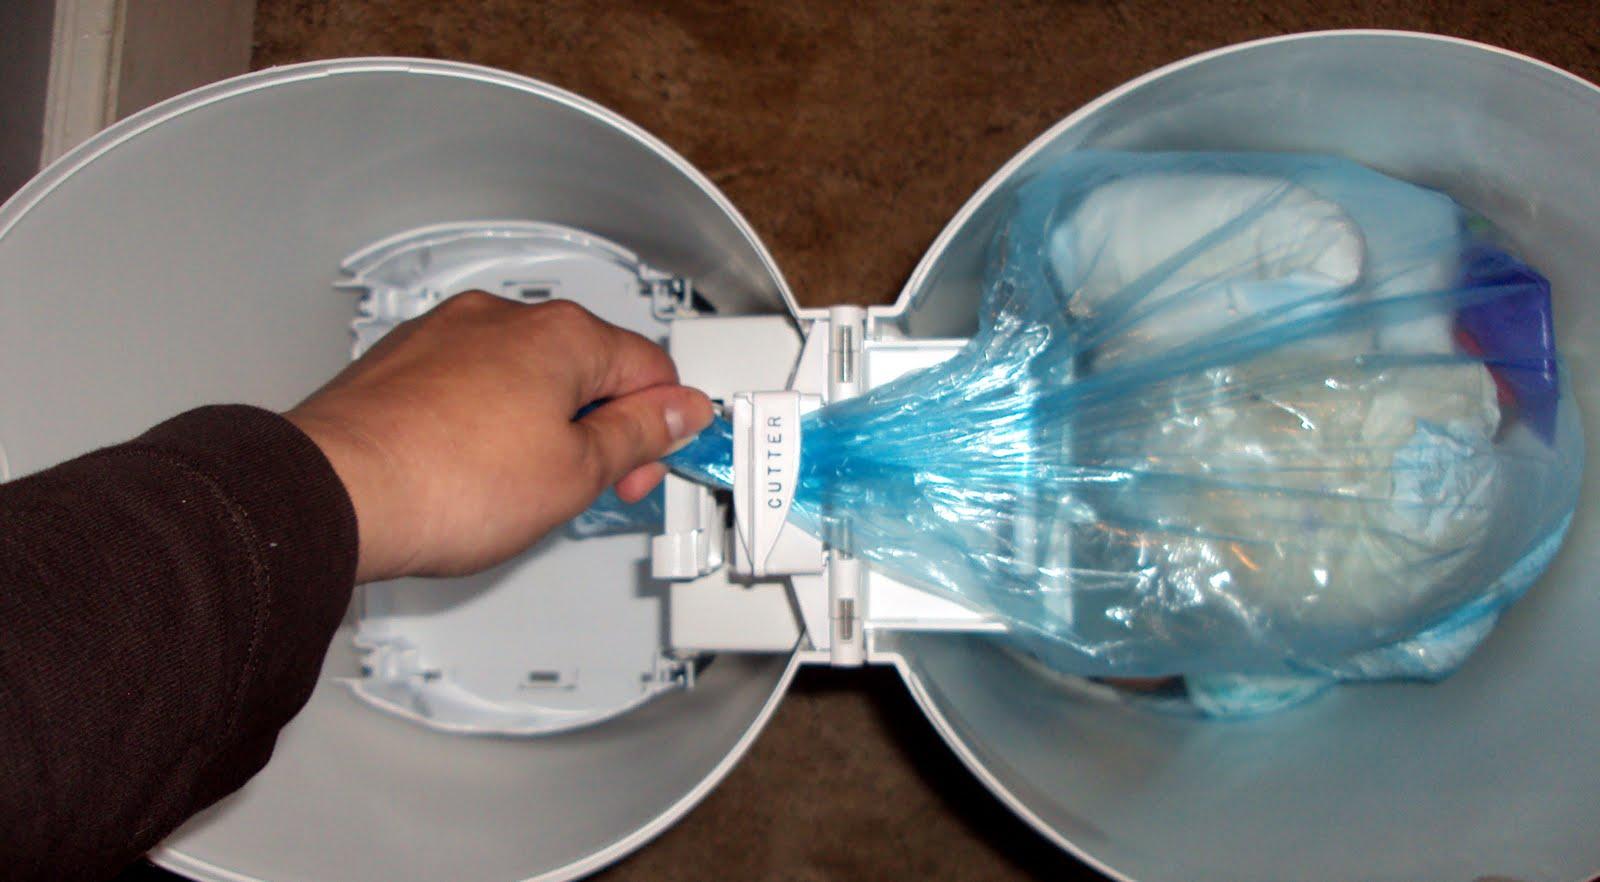 diaper pail test drive playtex diaper genie ii elite momma d and rh mommadanddaboyz net Wipe Warmer Full Diaper Genie